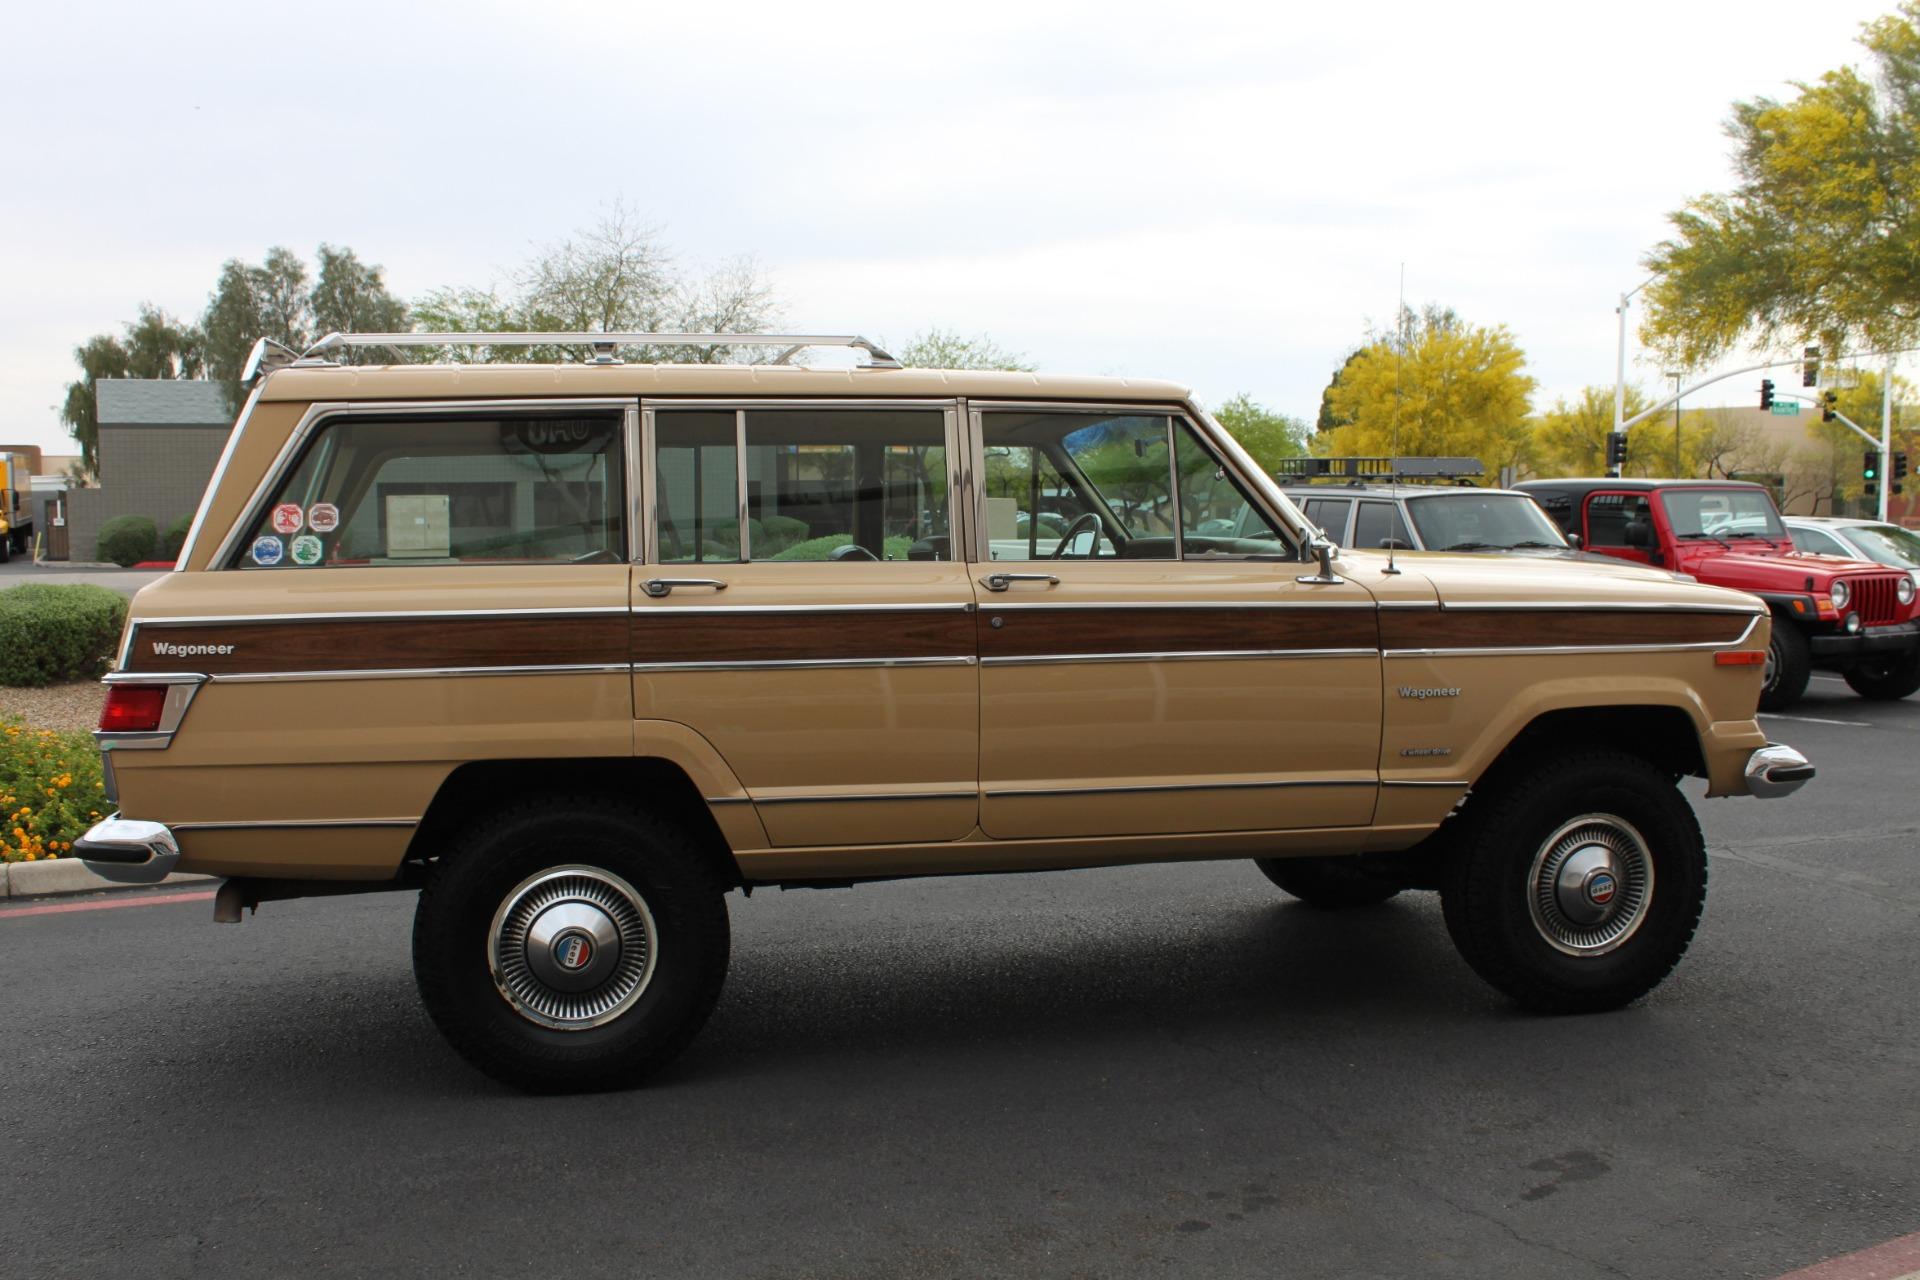 Used-1977-Jeep-Wagoneer-Brougham-Mercedes-Benz